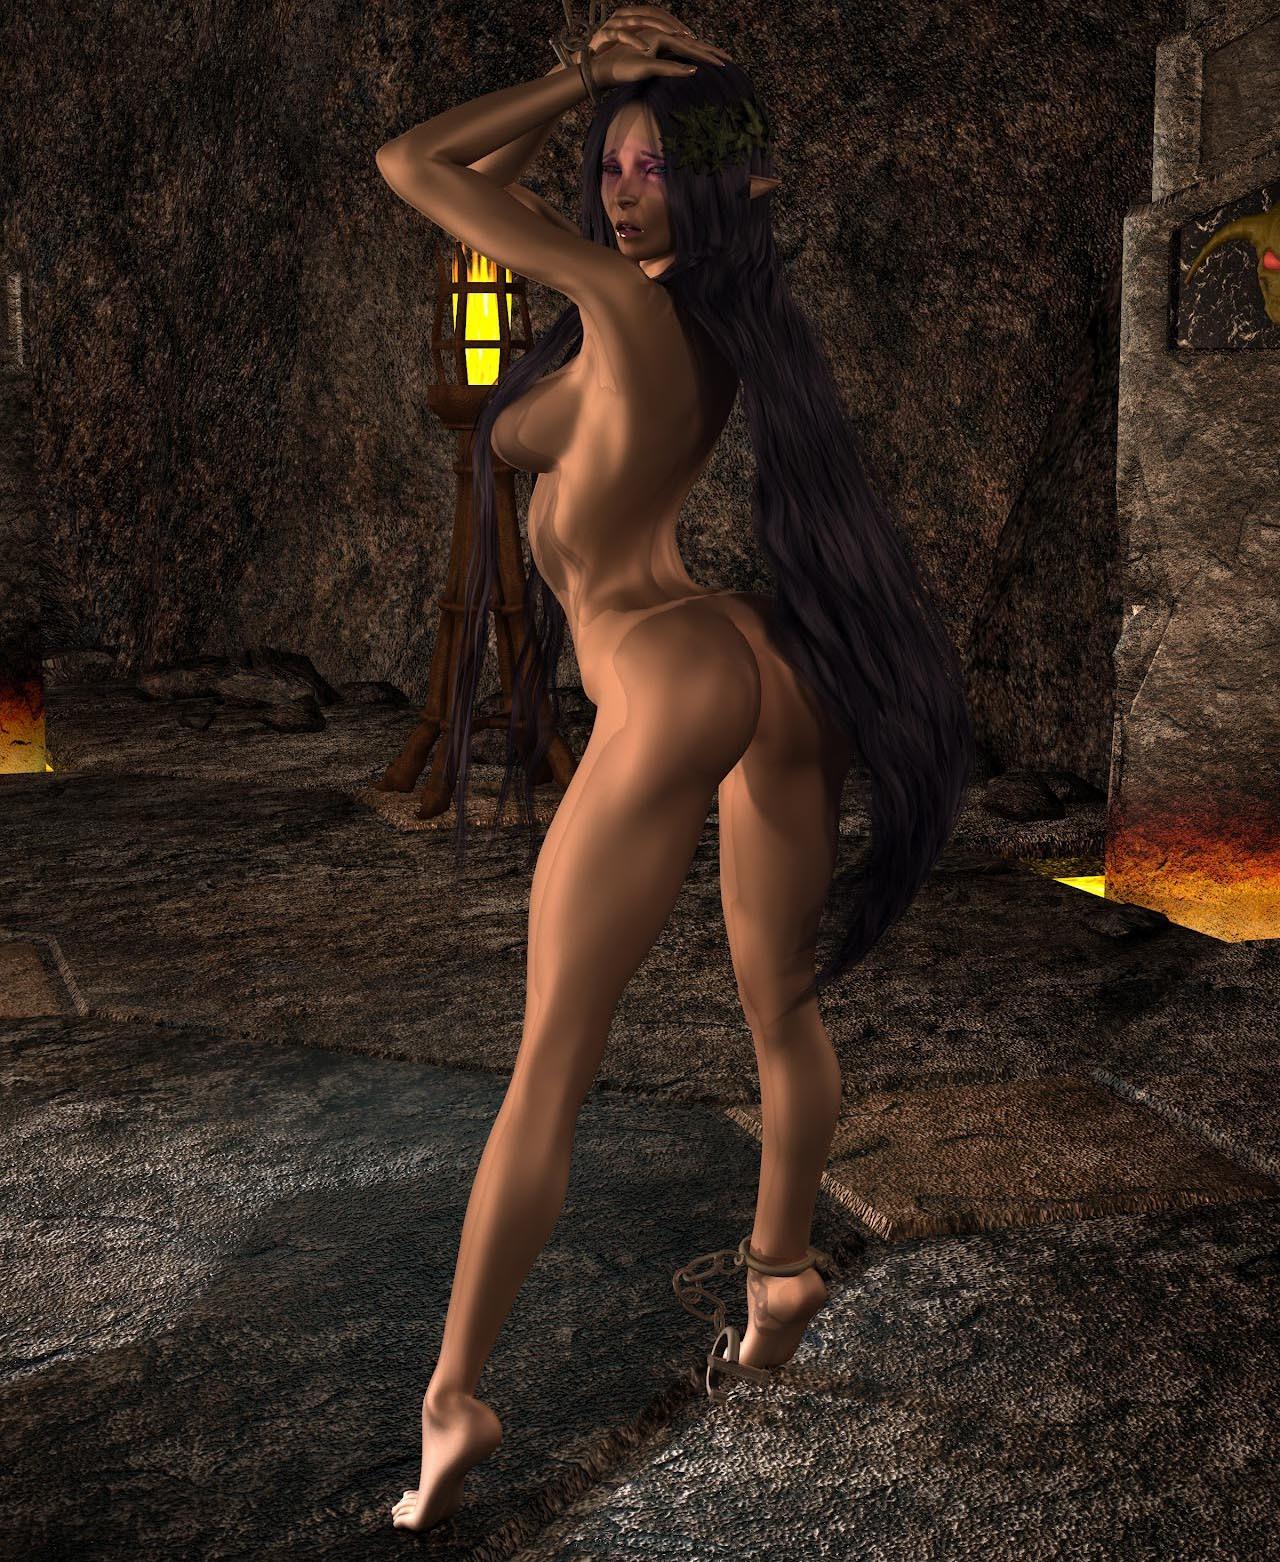 Prince of persia kaileena nude xxx pics erotic picture